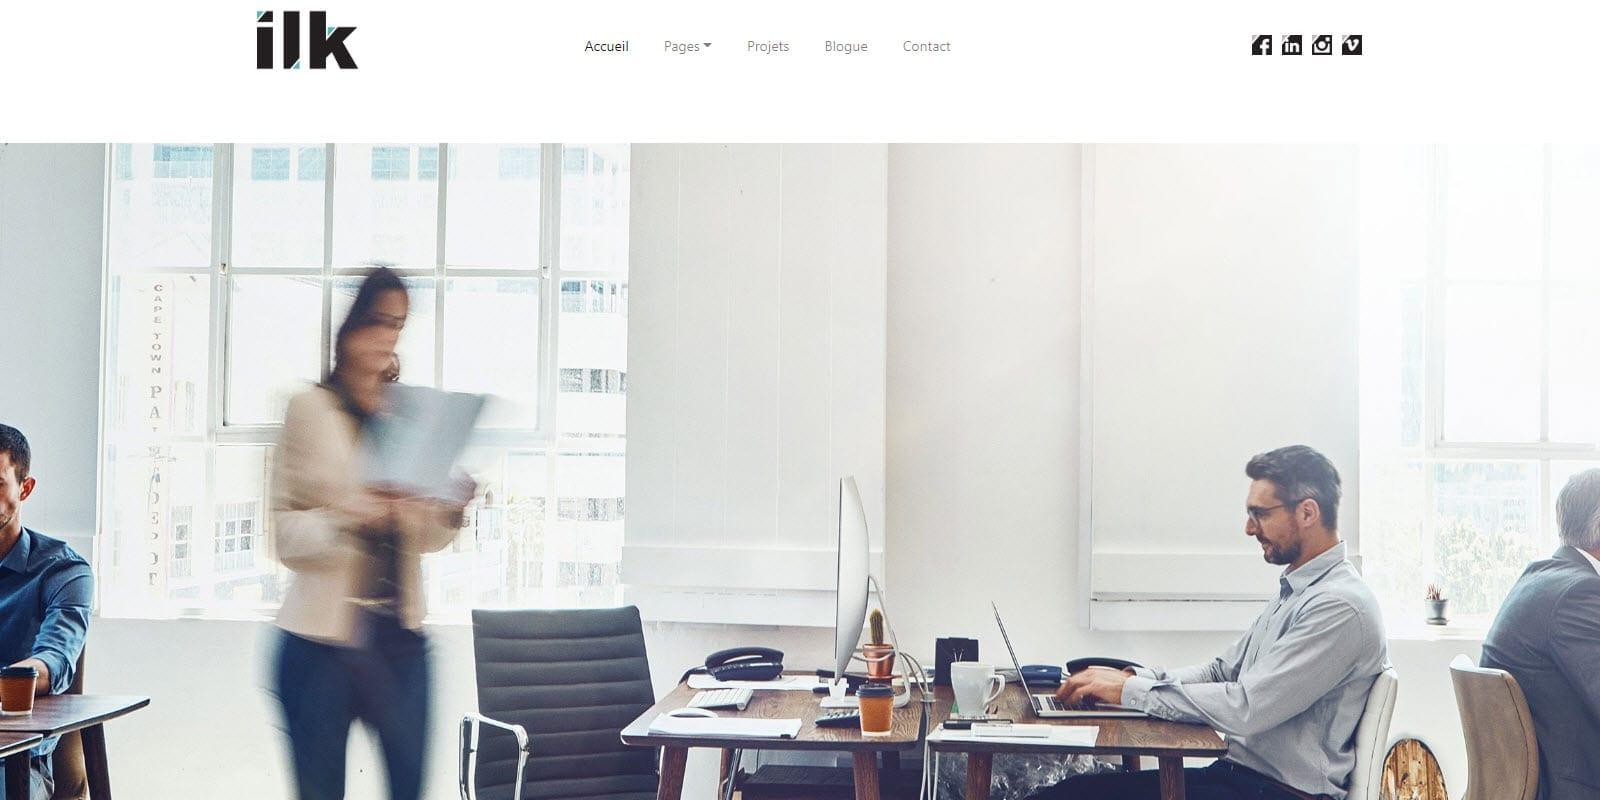 Thème WordPress : « ilk »